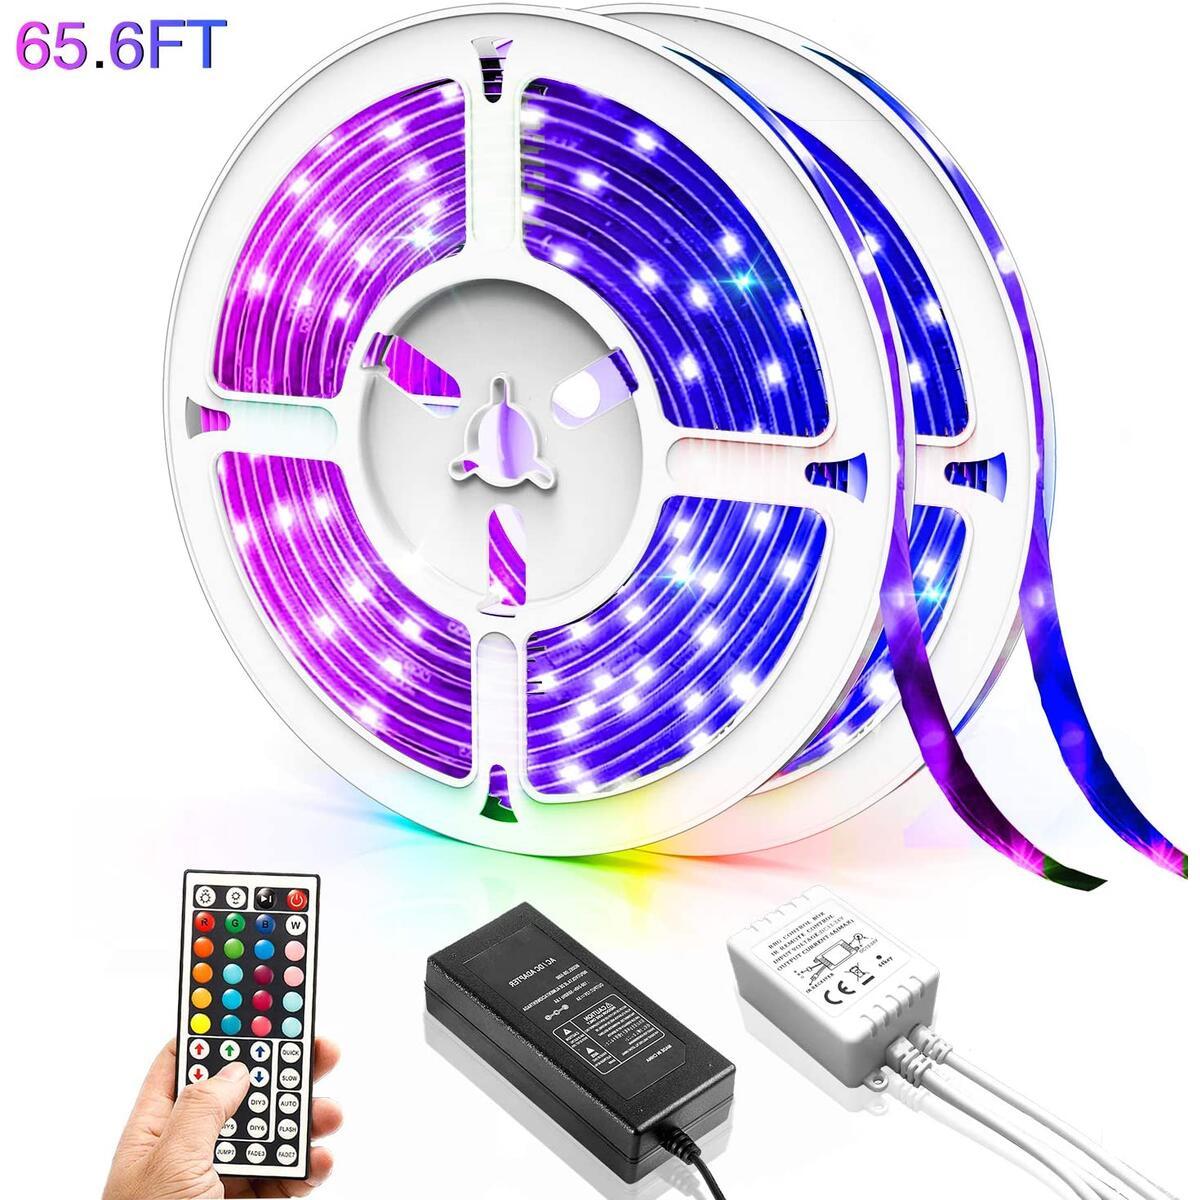 LED-Strip-Lights, RGB Light for Room, Brighter 5050 Color Changing Only for 65.6ft